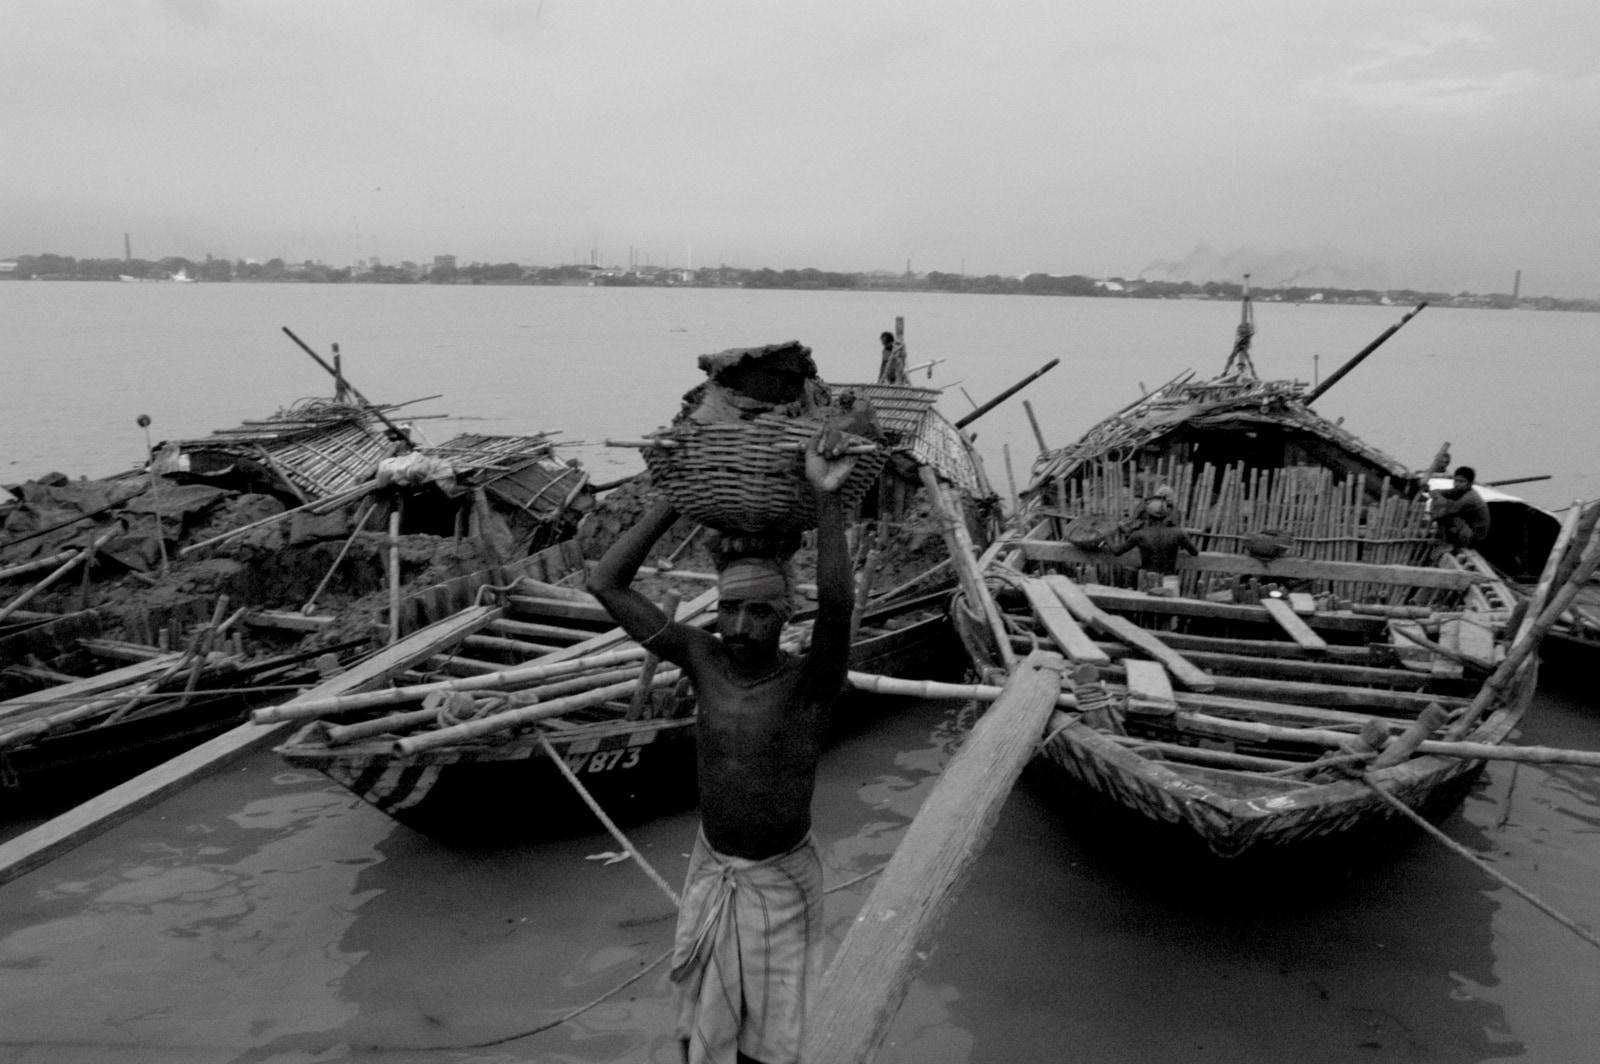 Kumartoli - The artisan village in the city of Calcutta - cnbctv18.com